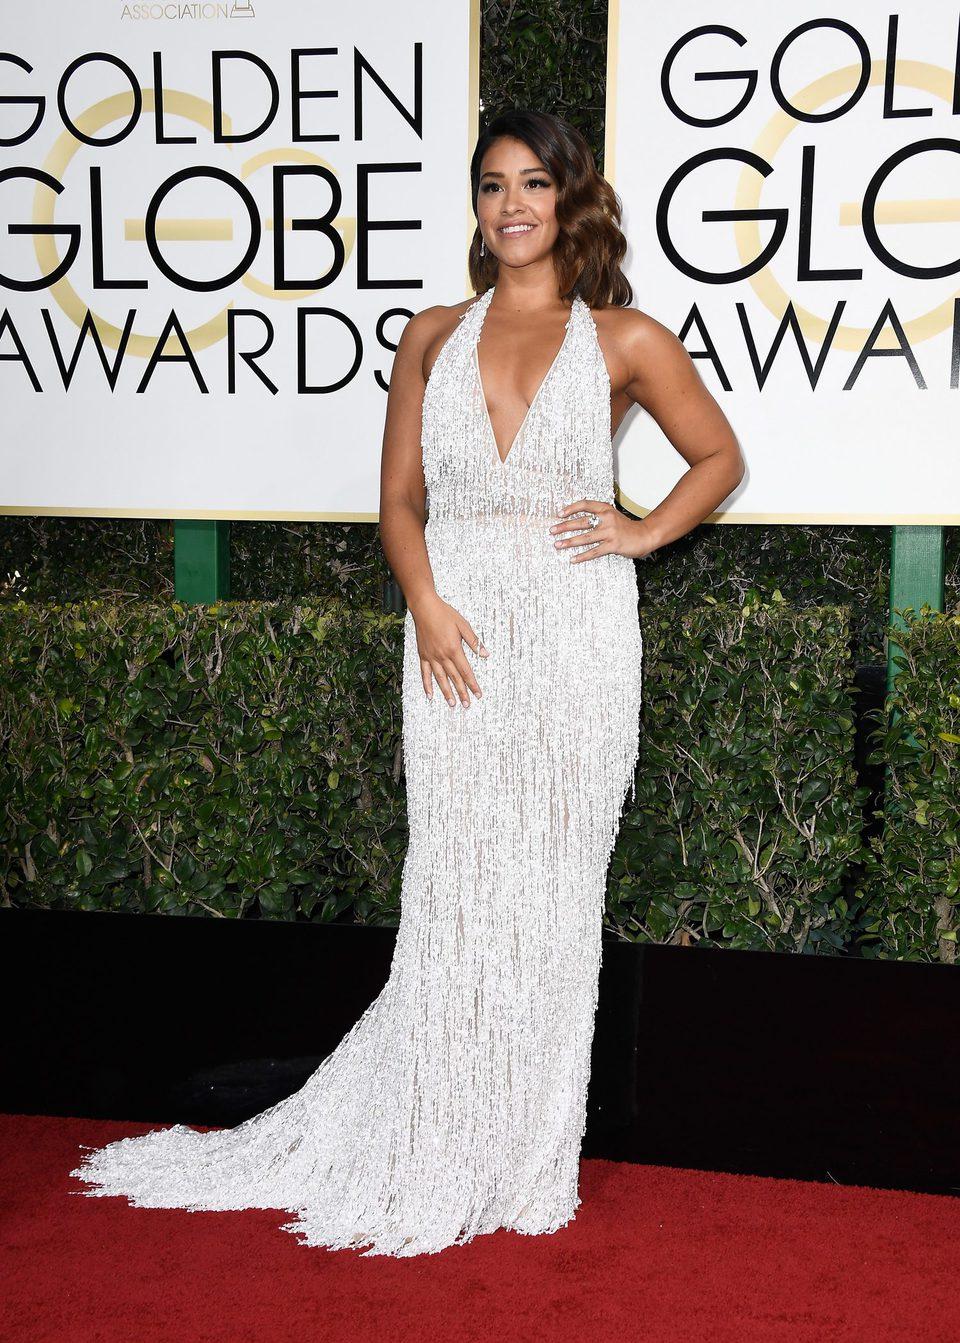 Gina Rodriguez at Golden Globes 2017 red carpet